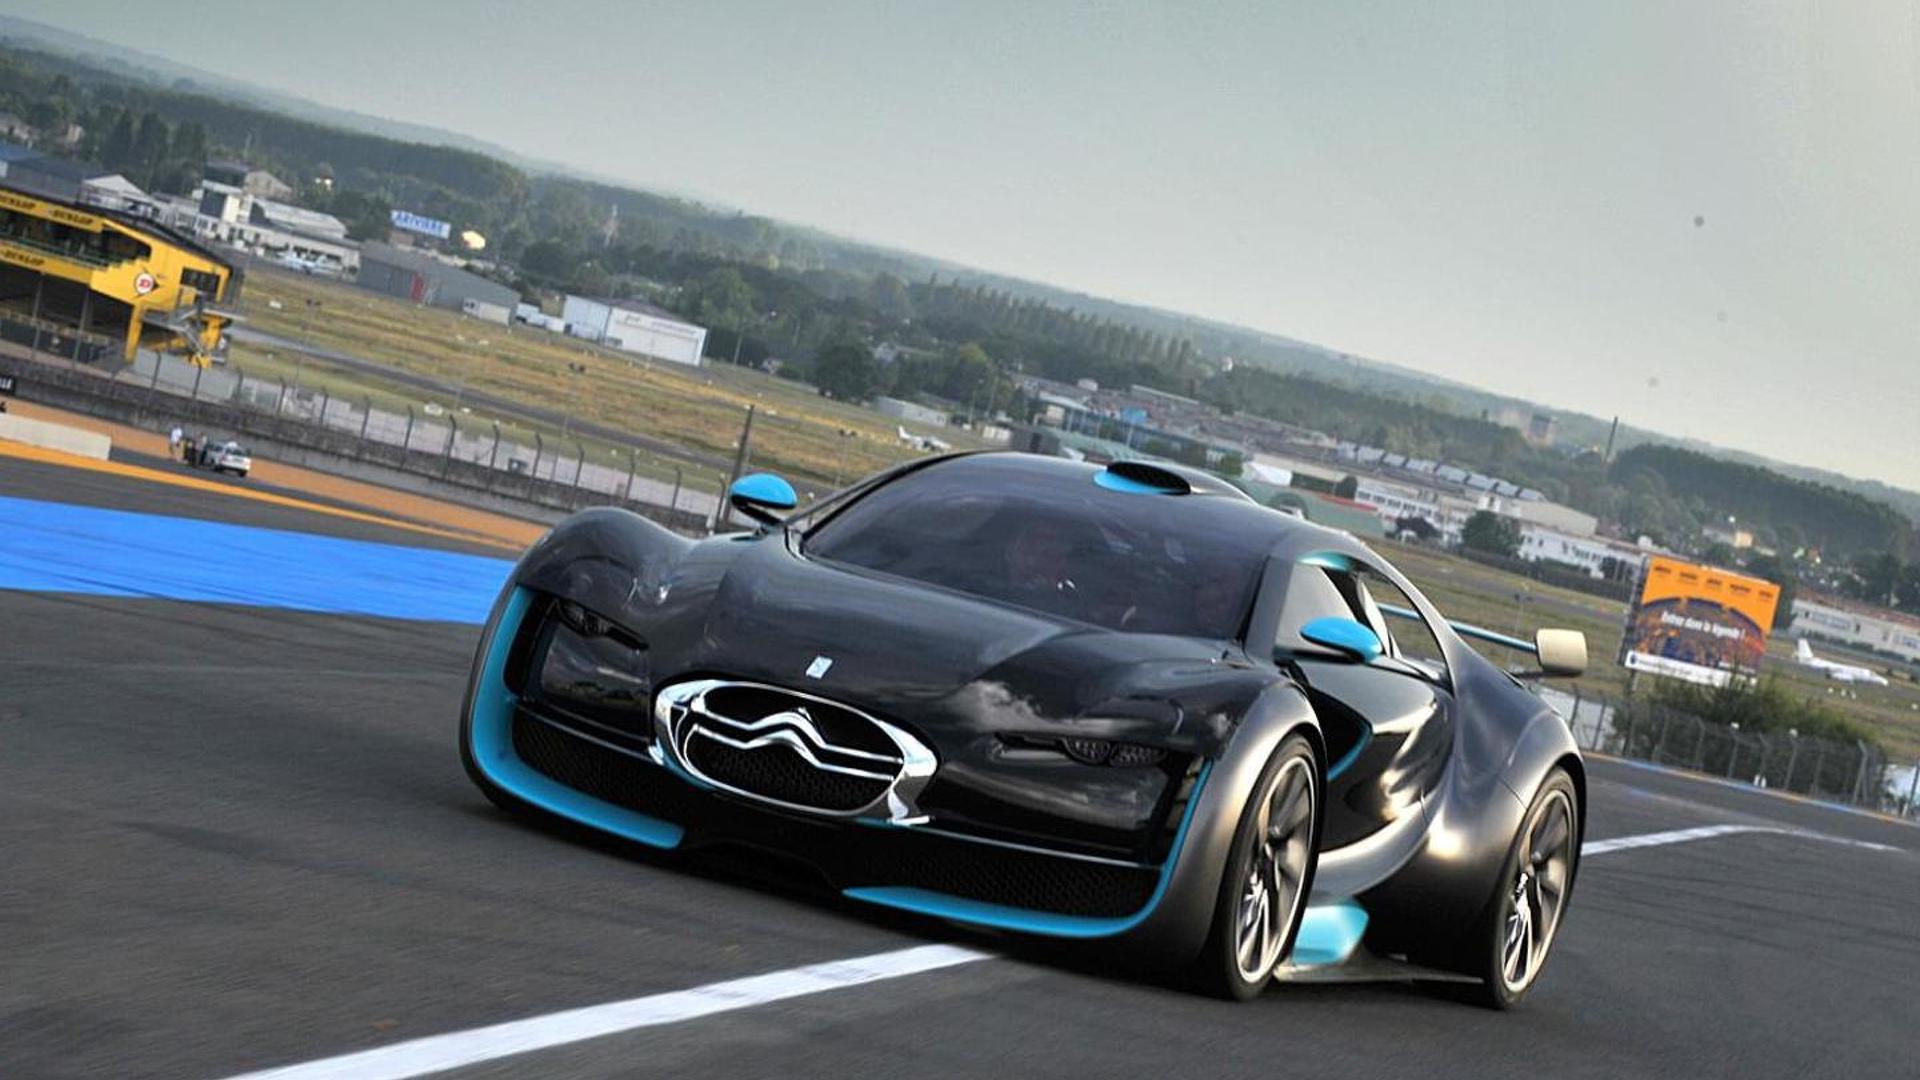 Citroen Survolt & Metropolis concepts edge close to production